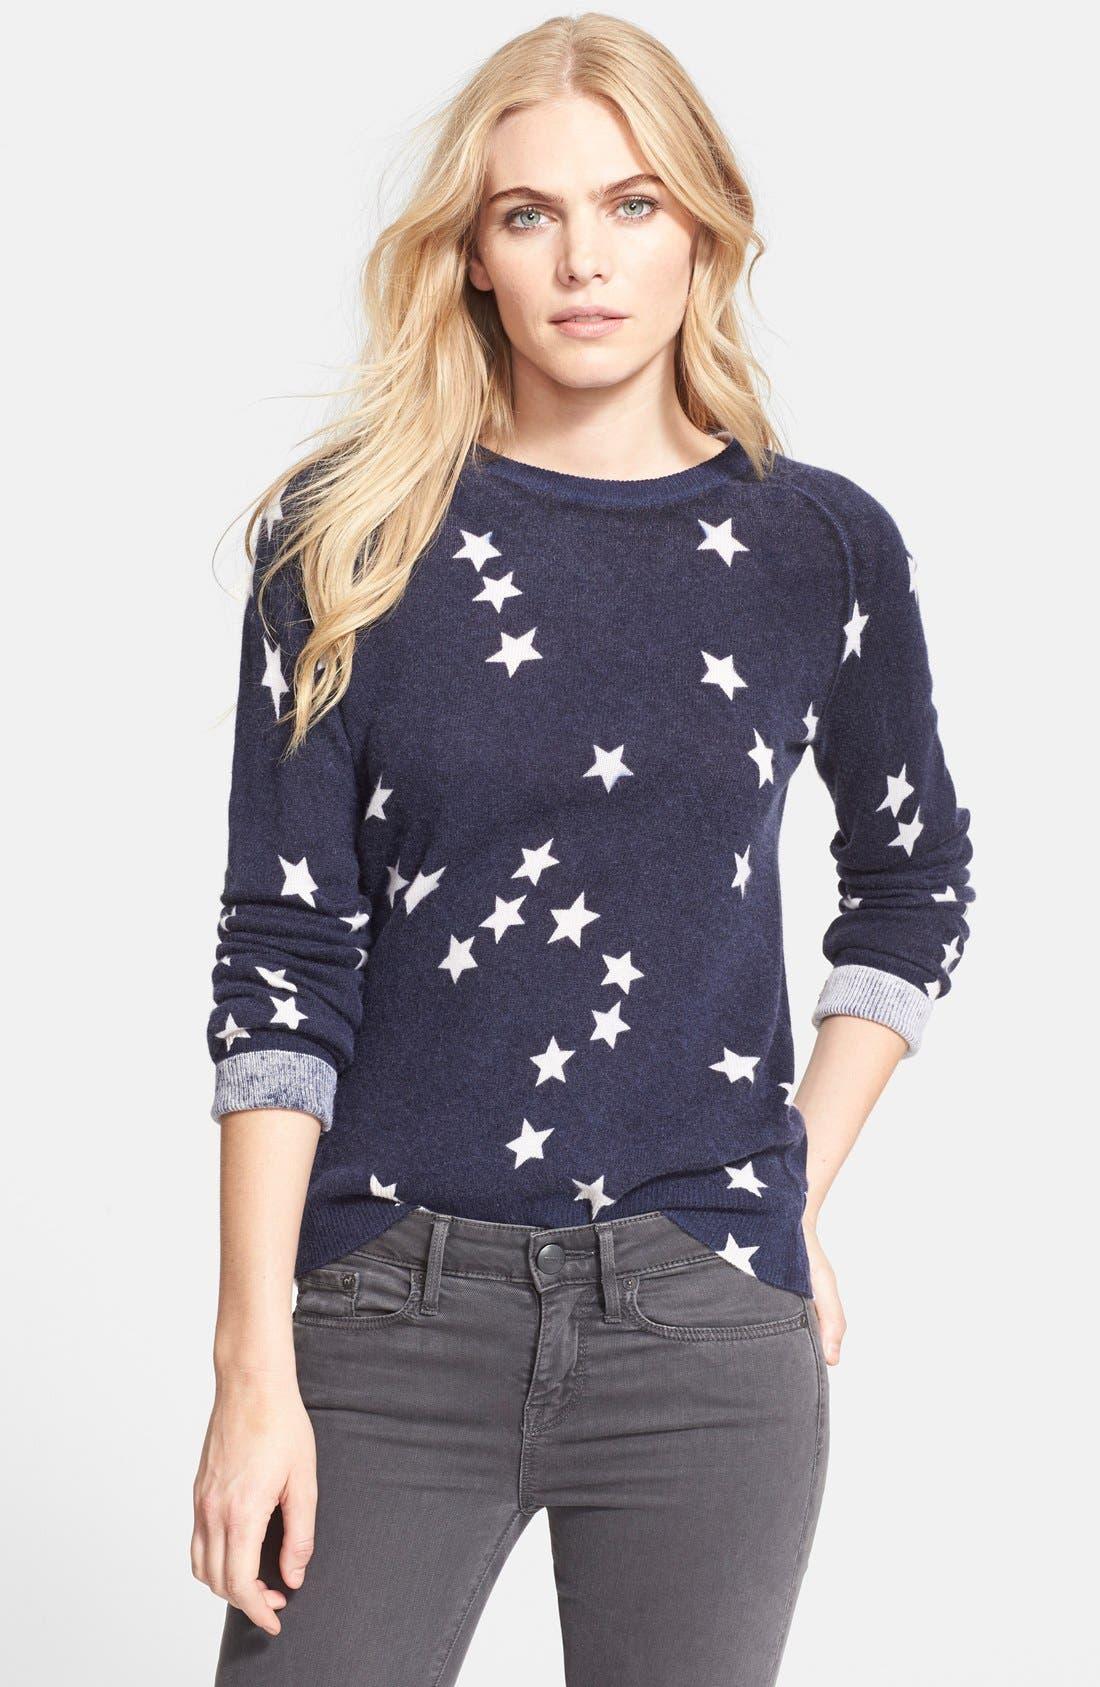 Main Image - Equipment 'Sloan' Star Pattern Cashmere Sweater